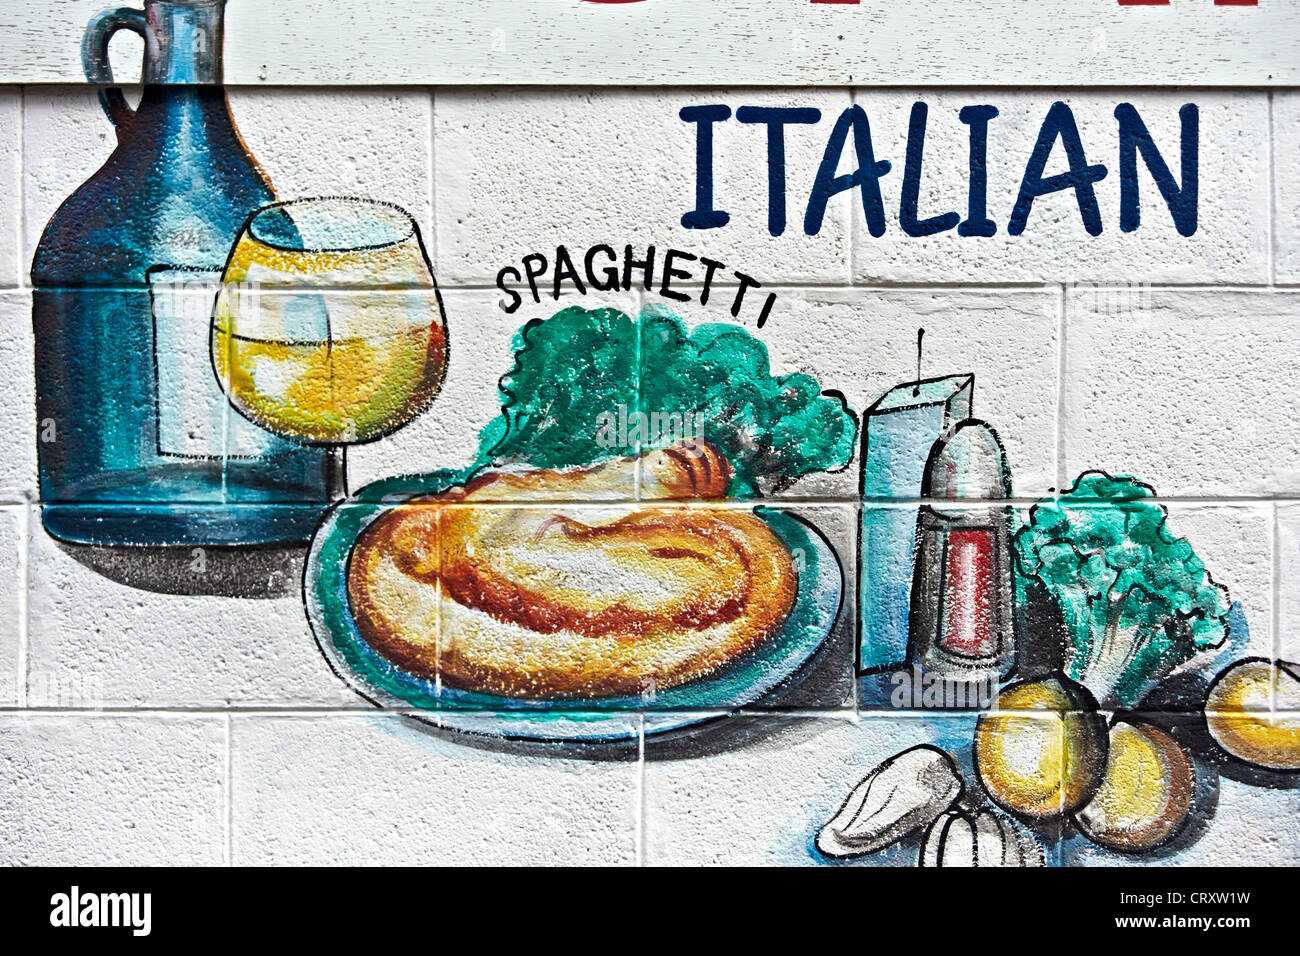 Wall Art Advertising Illustration Of Food At An Italian Restaurant Stock Photo Alamy